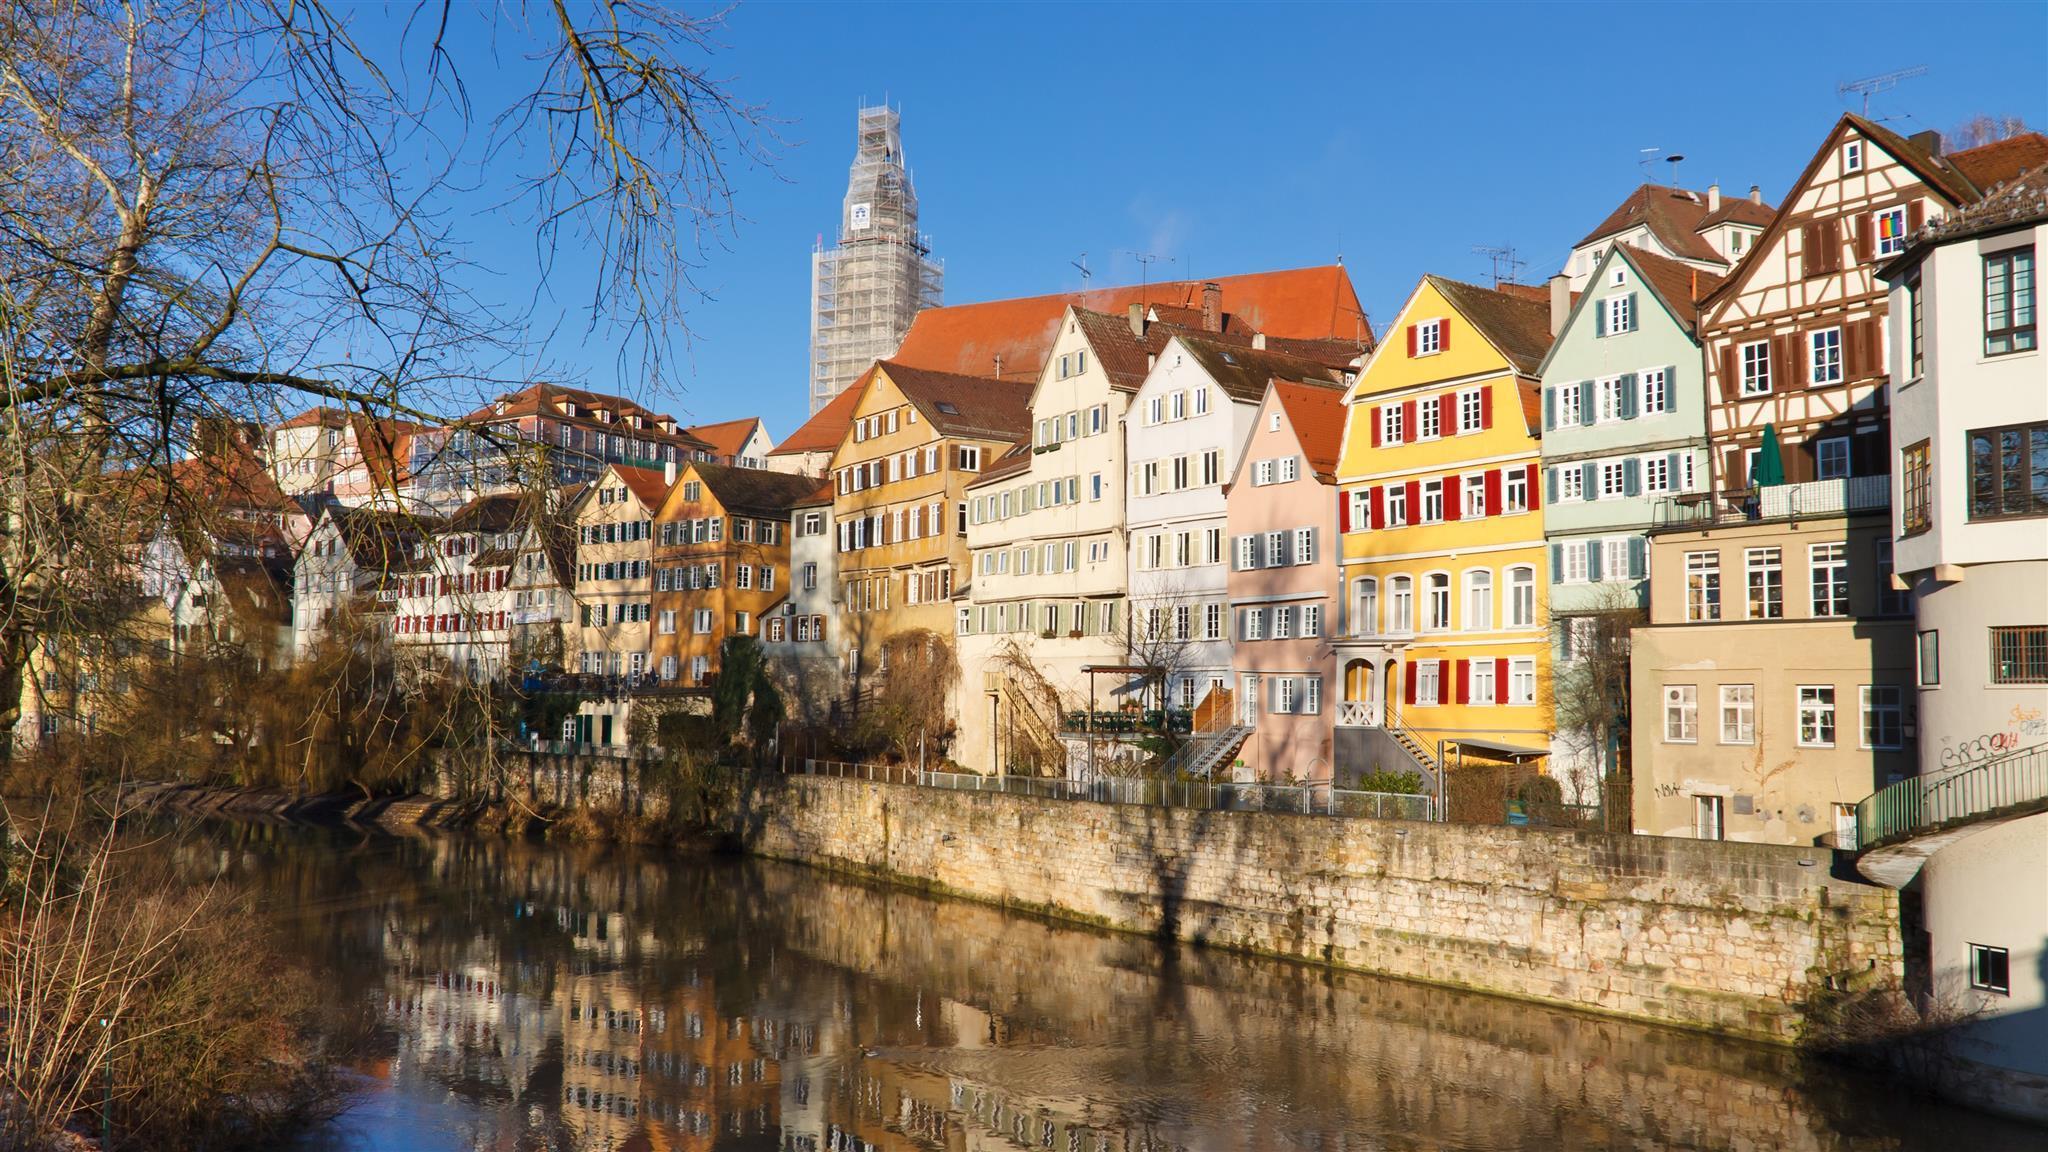 10 Best Tubingen Hotels Hd Photos Reviews Of Hotels In